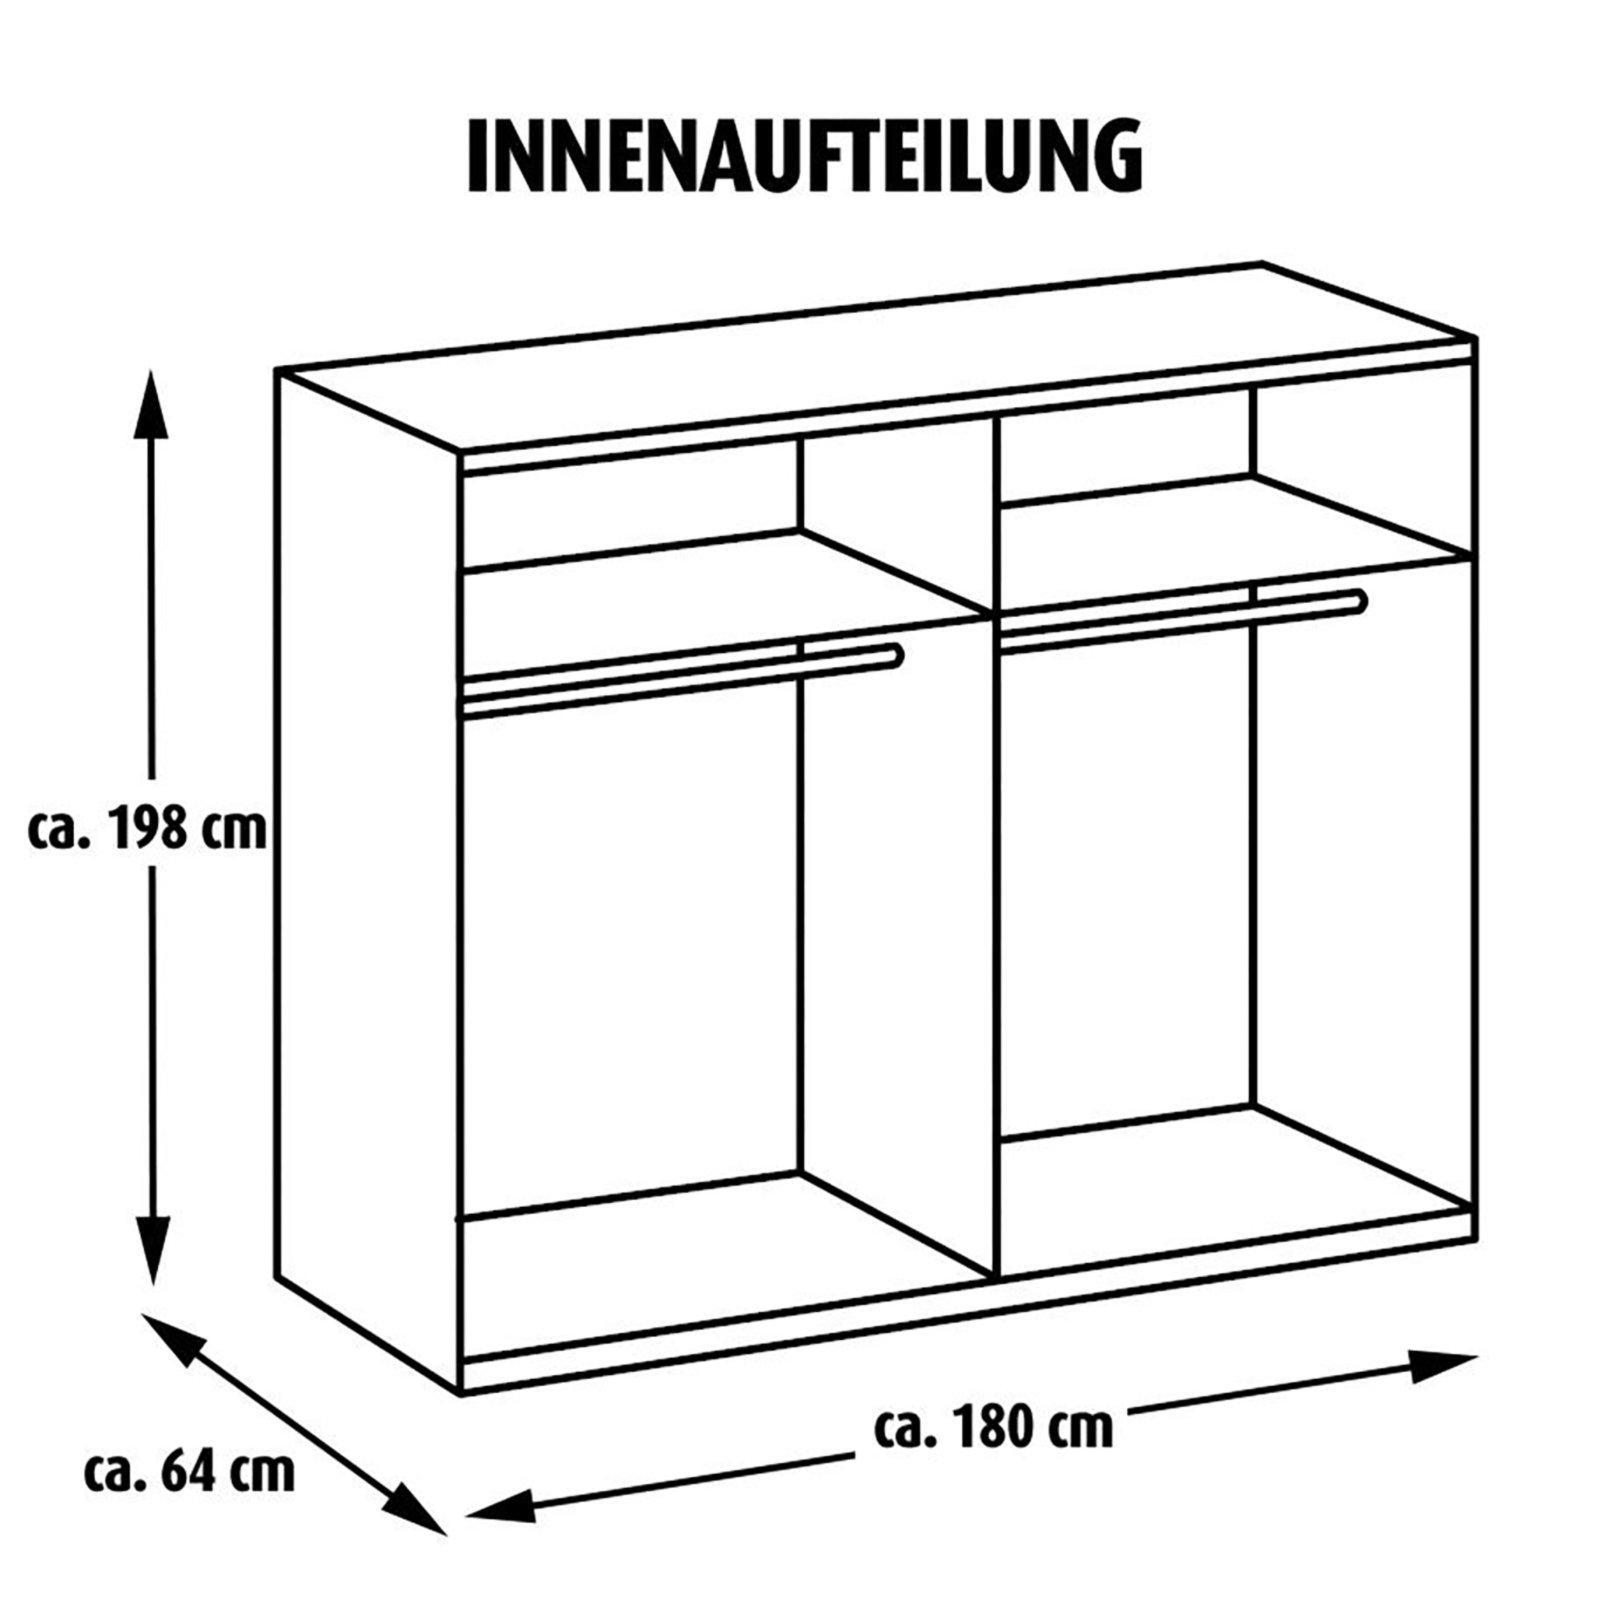 schwebet renschrank queen alpinwei 180 cm breit ebay. Black Bedroom Furniture Sets. Home Design Ideas